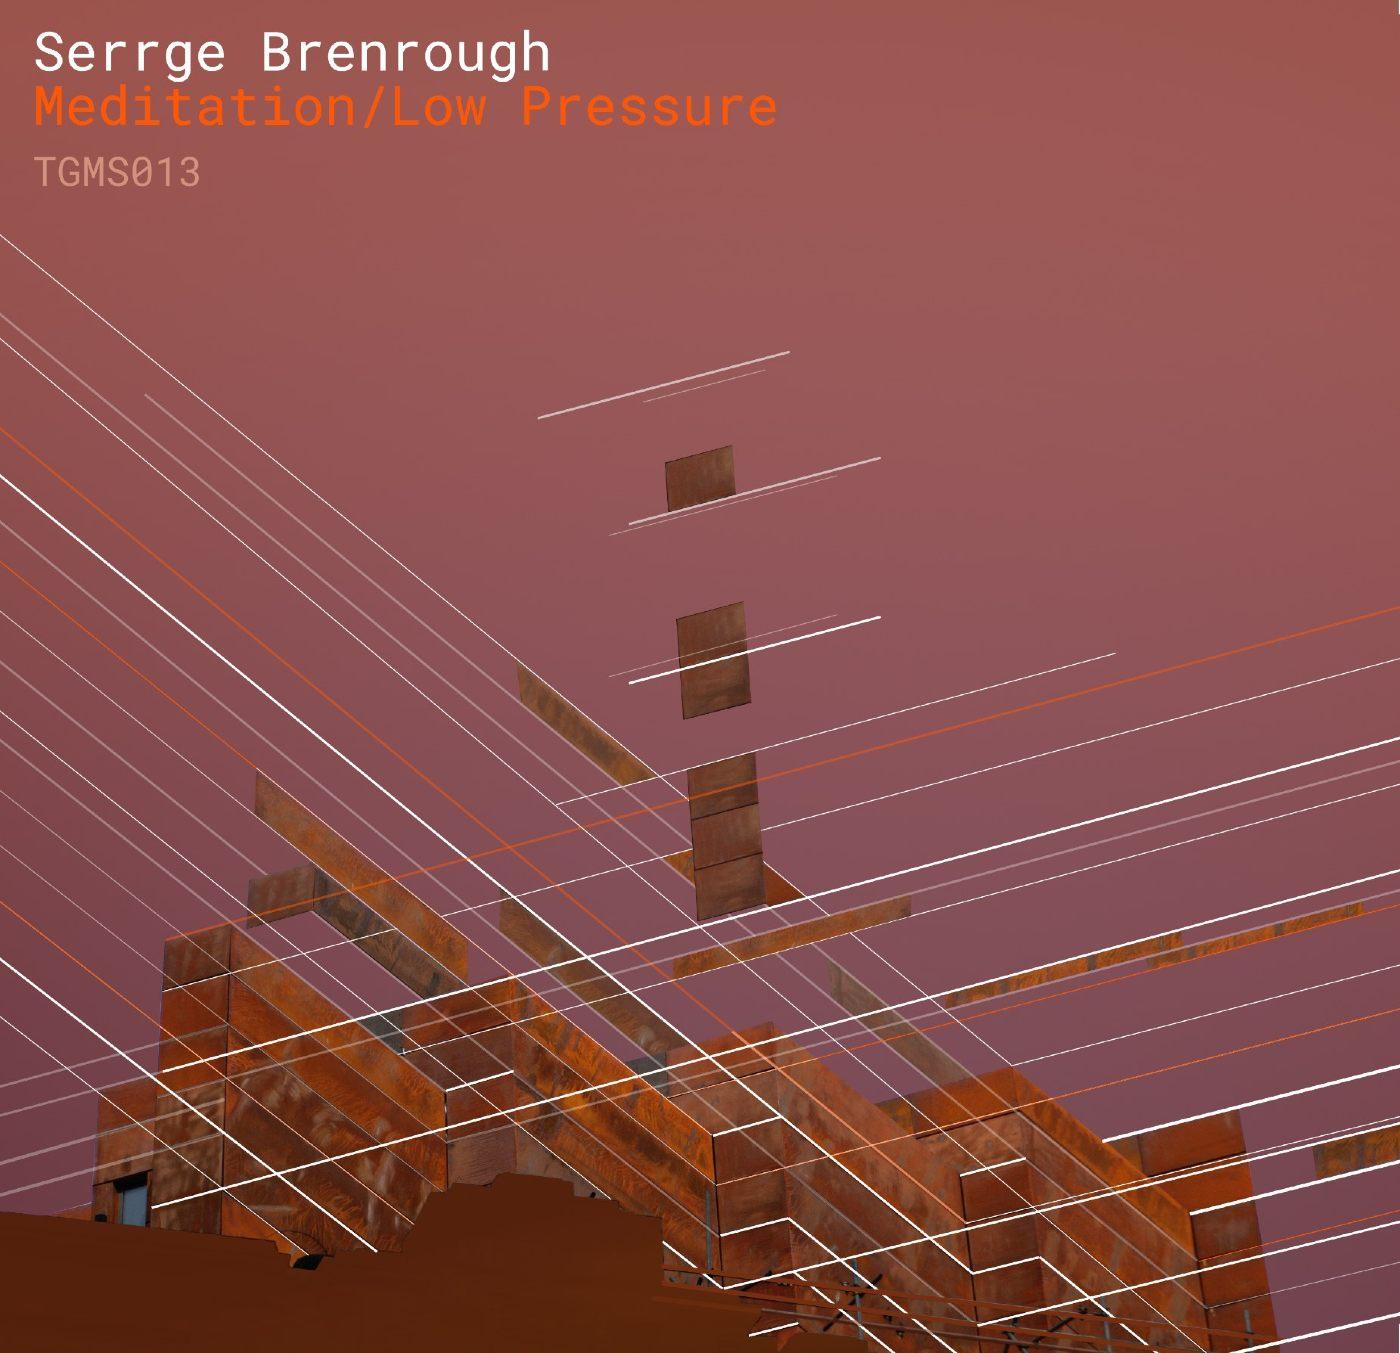 Serrge Brenrough - meditation / low pressure